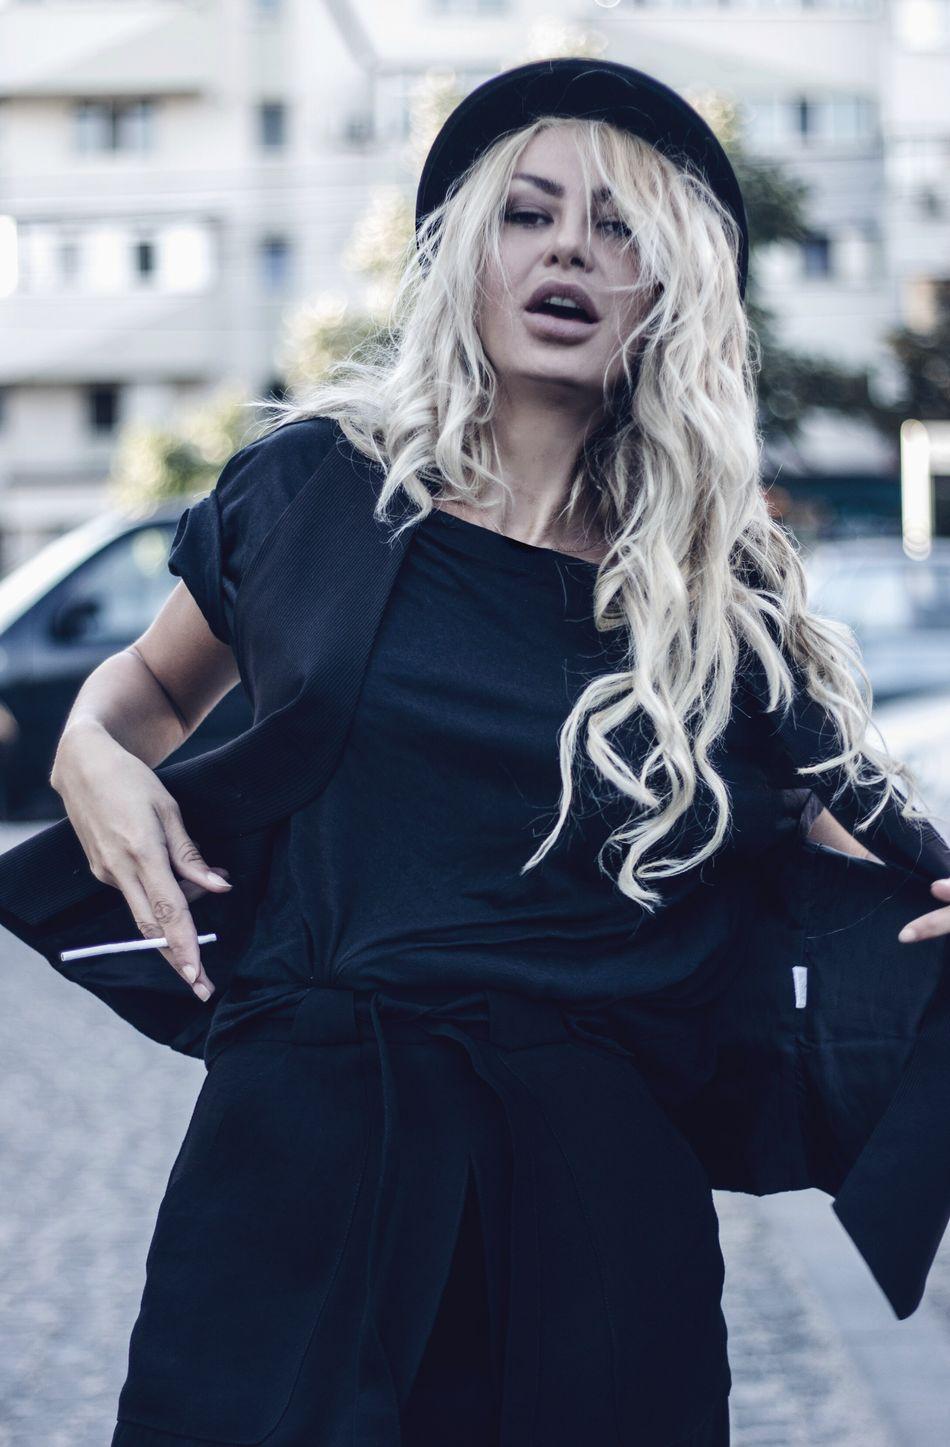 Fashion #style #stylish #love #TagsForLikes #me #cute #photooftheday #nails #hair #beauty #beautiful #instagood #instafashion # Vagabond Style Hat Fashion Photography Street Fashion Fine Art Photography Fashionstreetstyle Style Vagabond Streetphotography Street Style